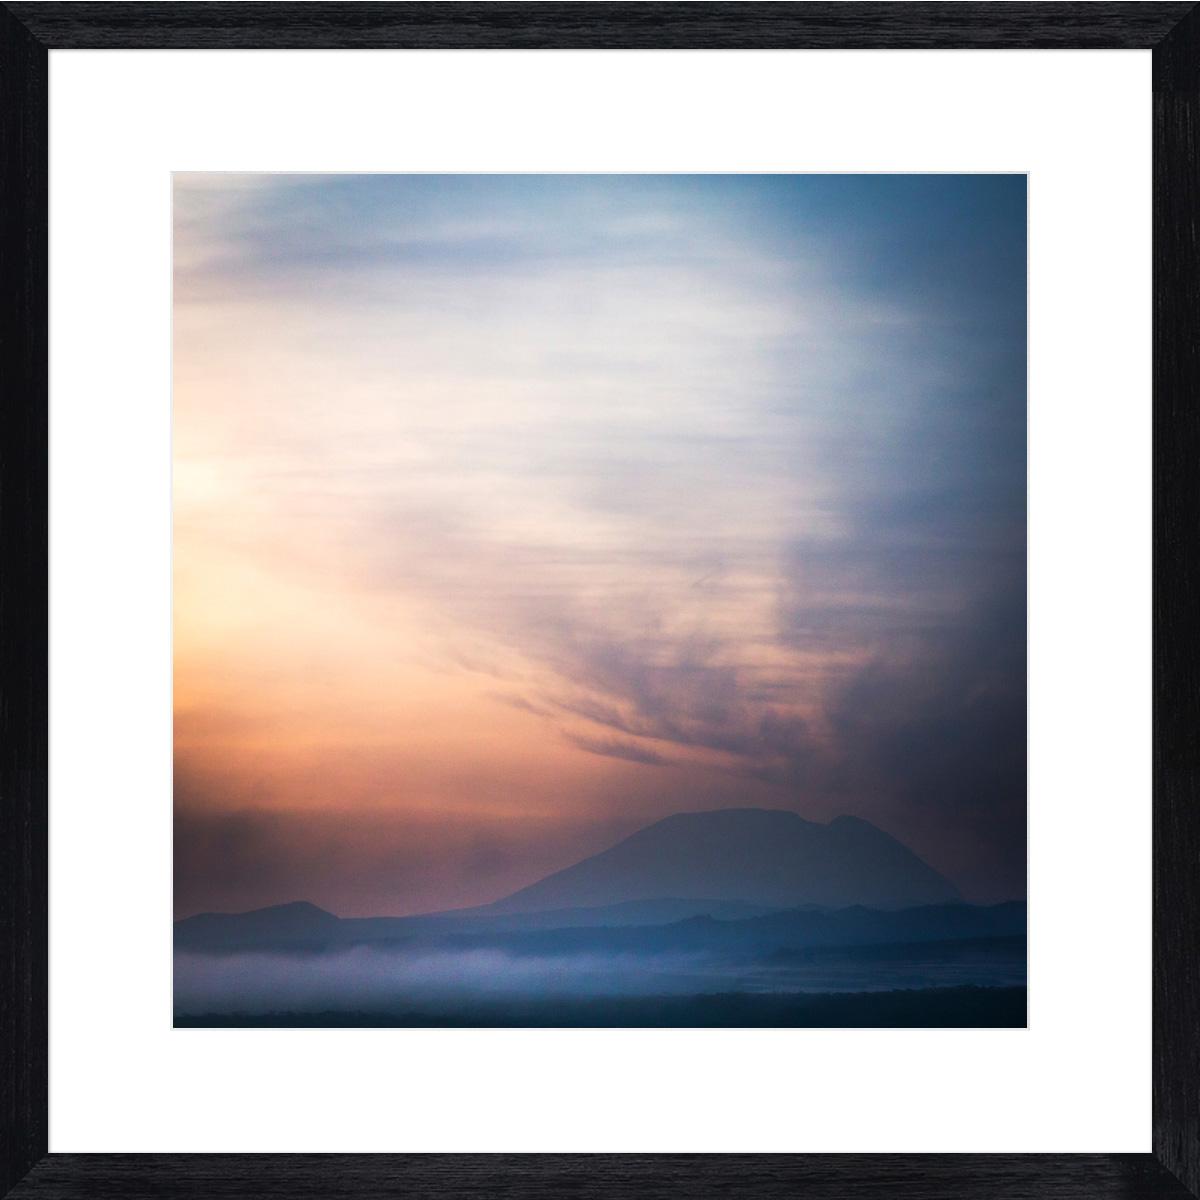 Kilimanjaro-Dawn-Black